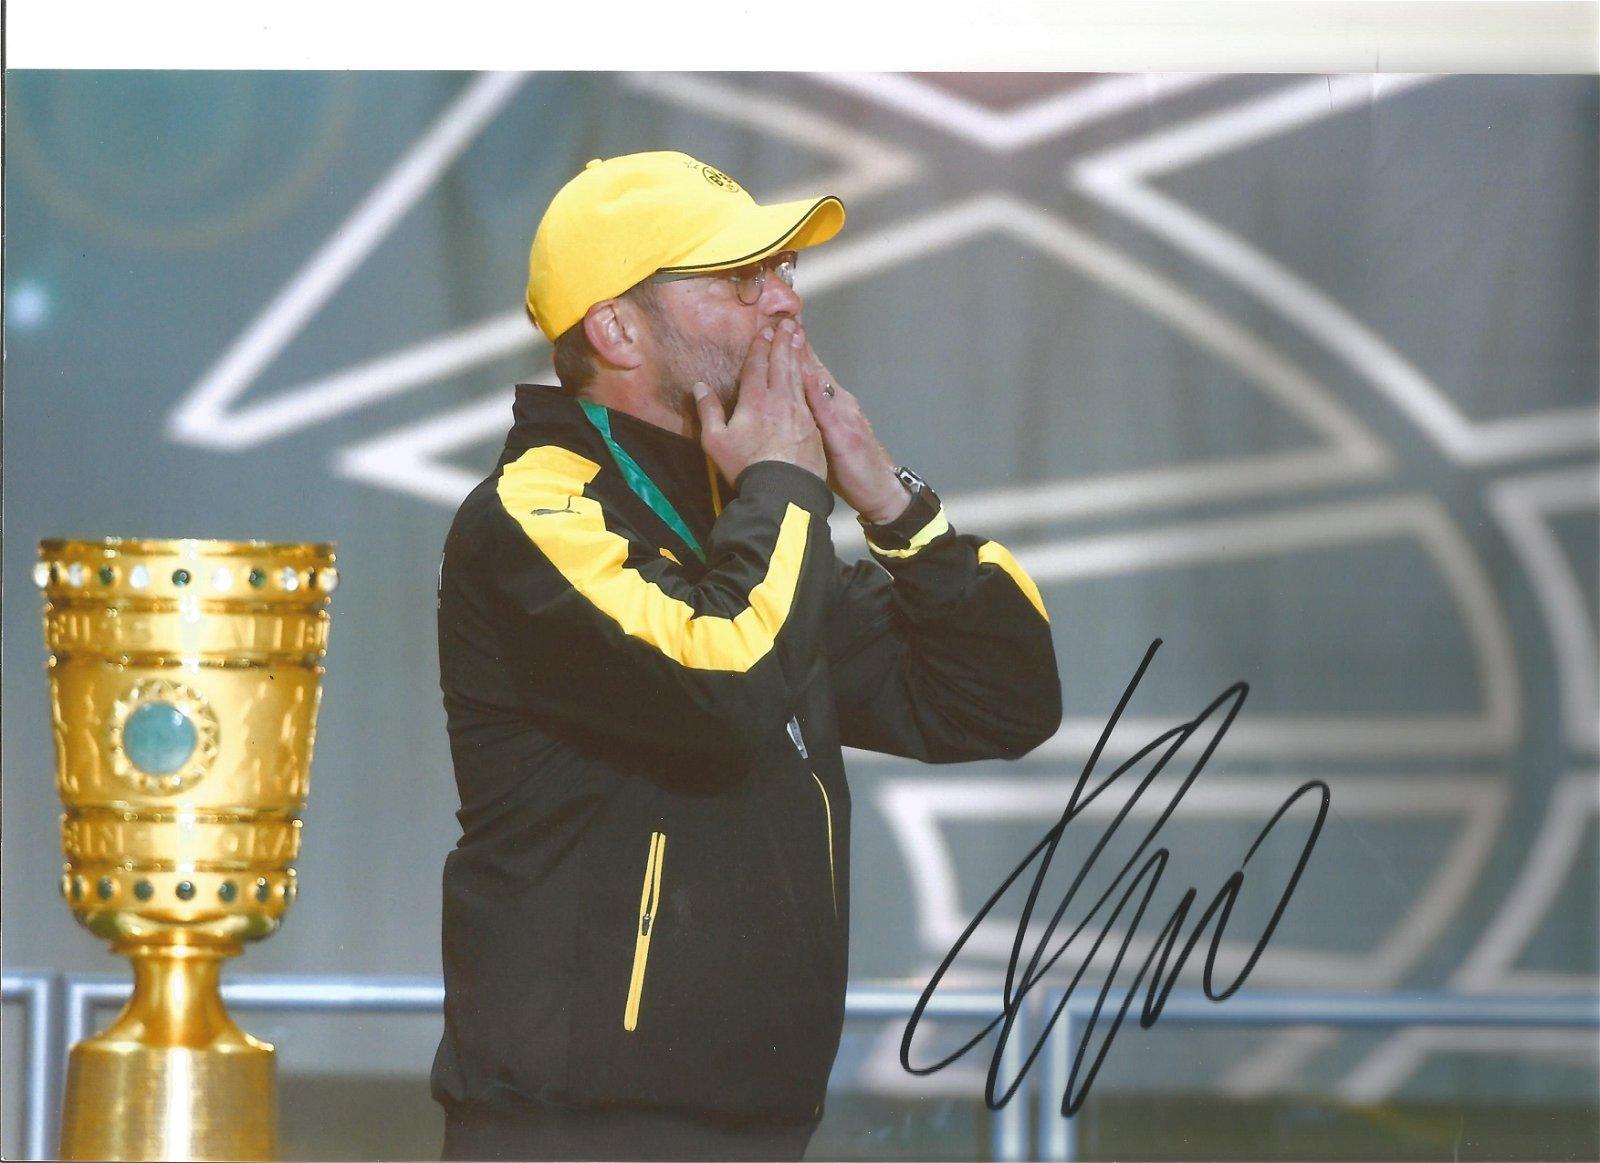 Jurgen Klopp signed 12x8 colour Dortmund photo. Good